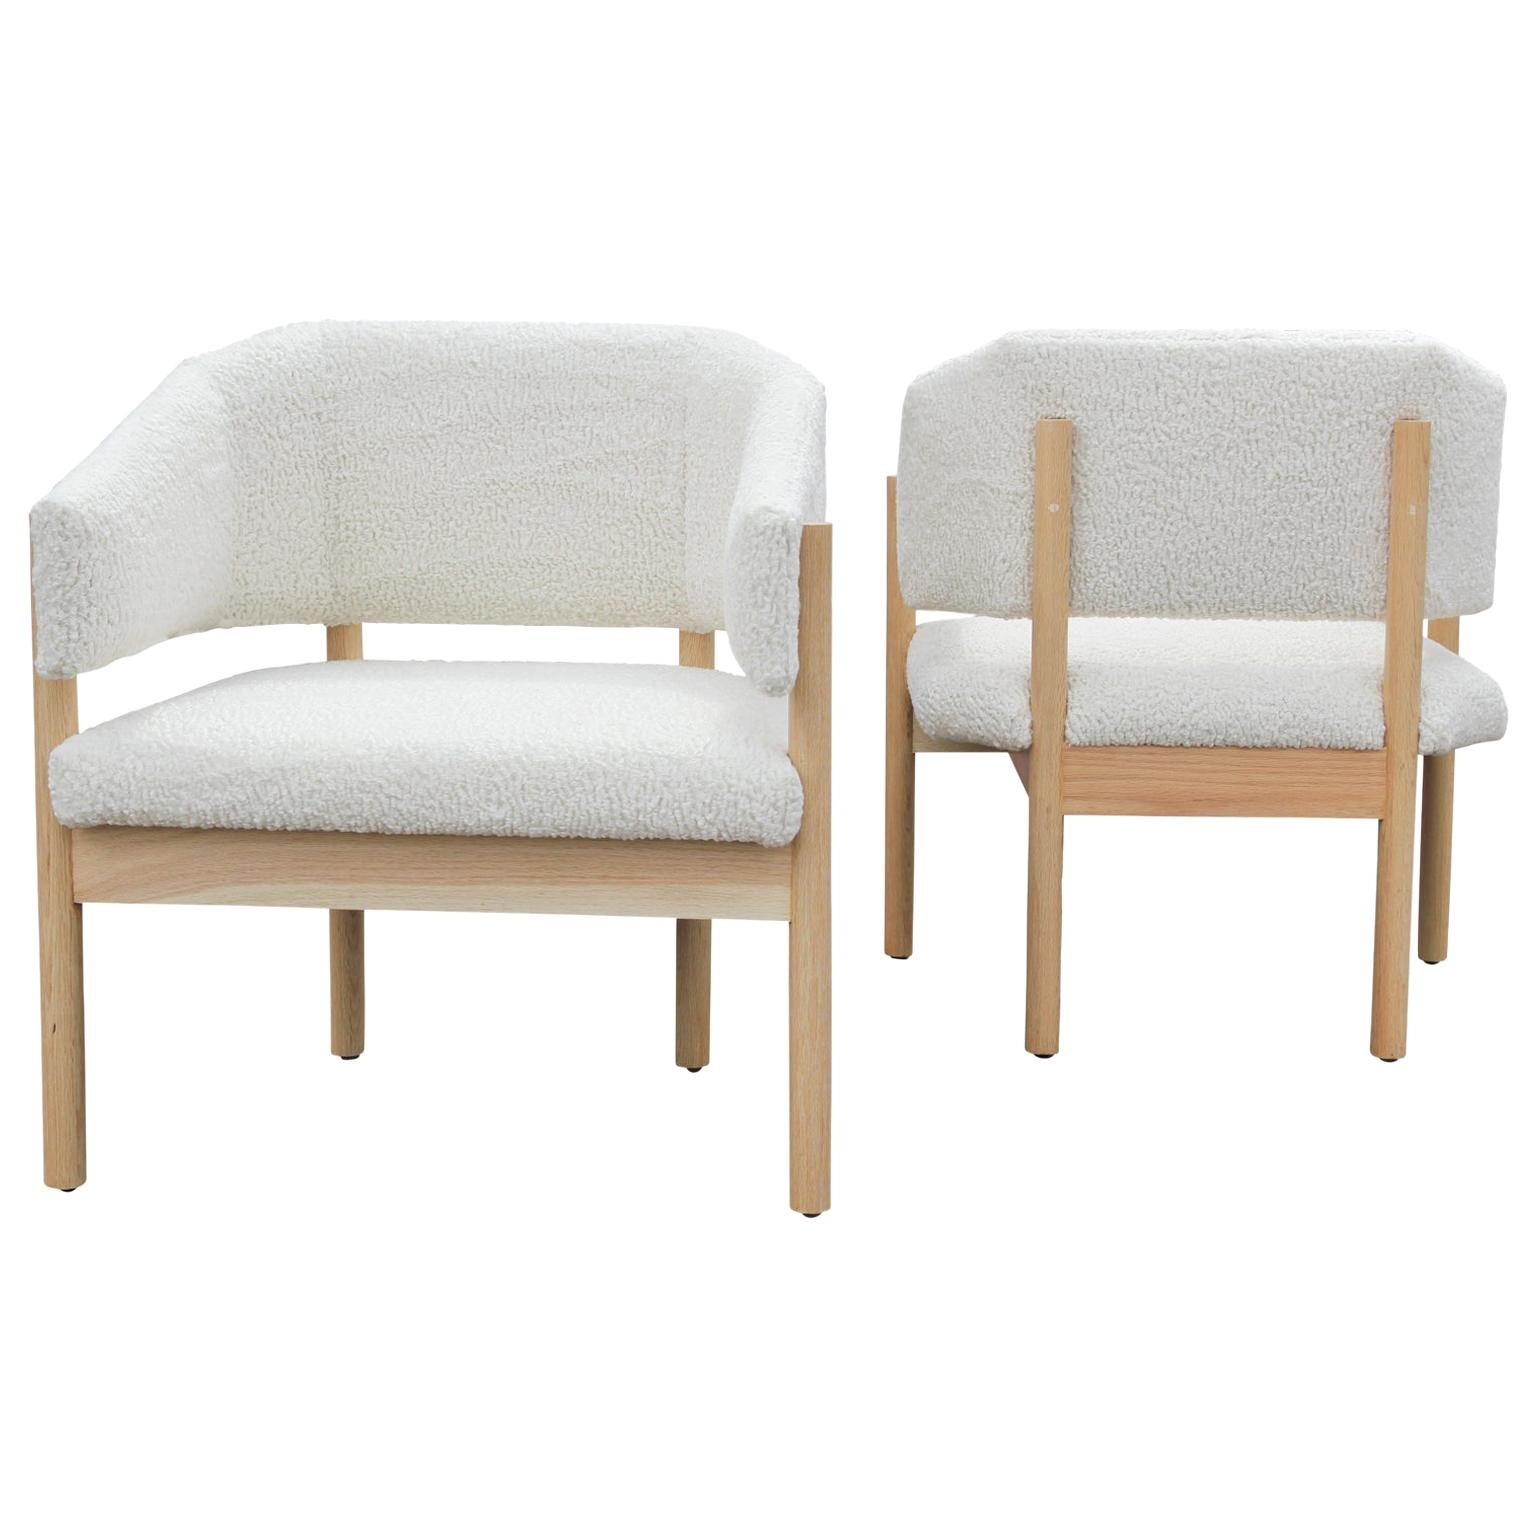 Pair of Custom Angular Post-Modern Shearling & Bleached White Oak Lounge Chairs